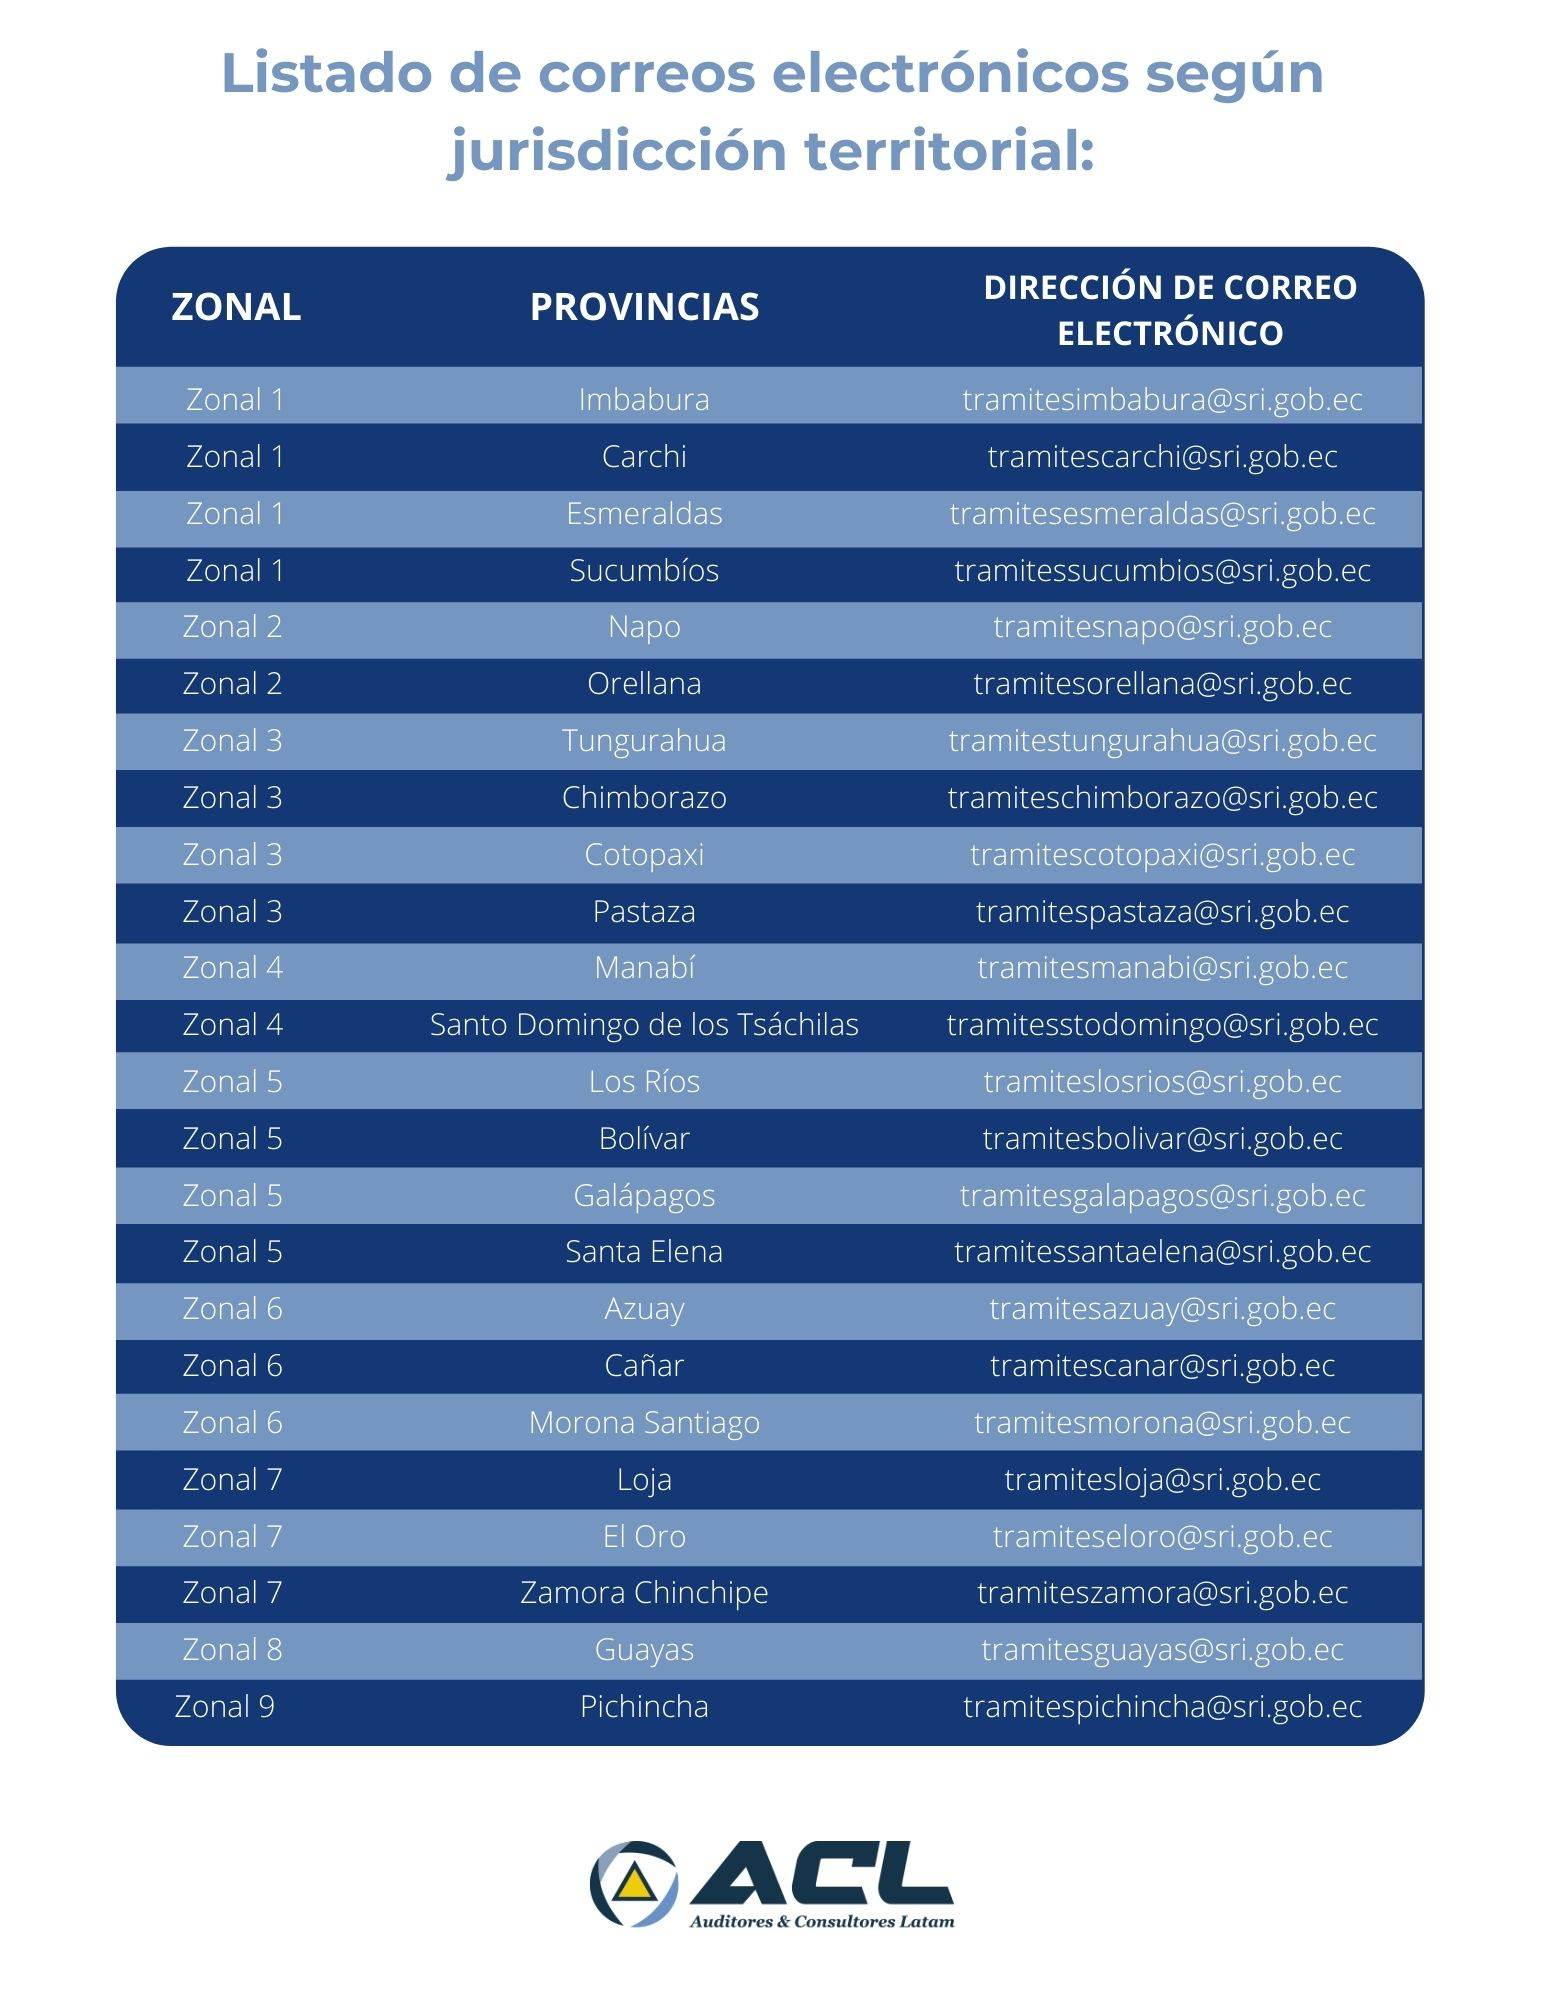 Listado de correos electrónicos según jurisdicción territorial_